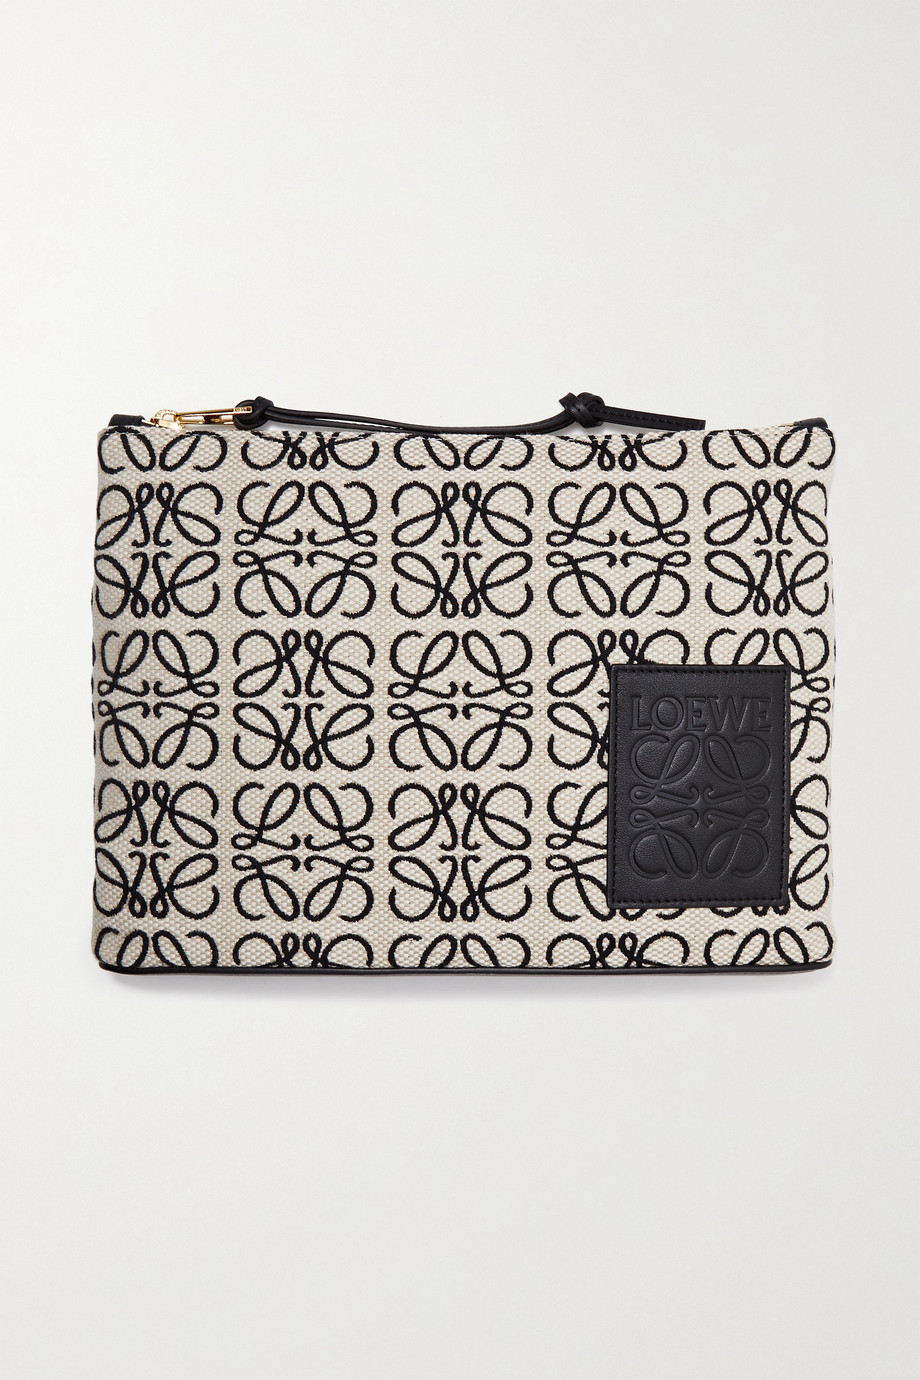 Loewe + Joe Brainard Anagram leather-trimmed canvas-jacquard pouch